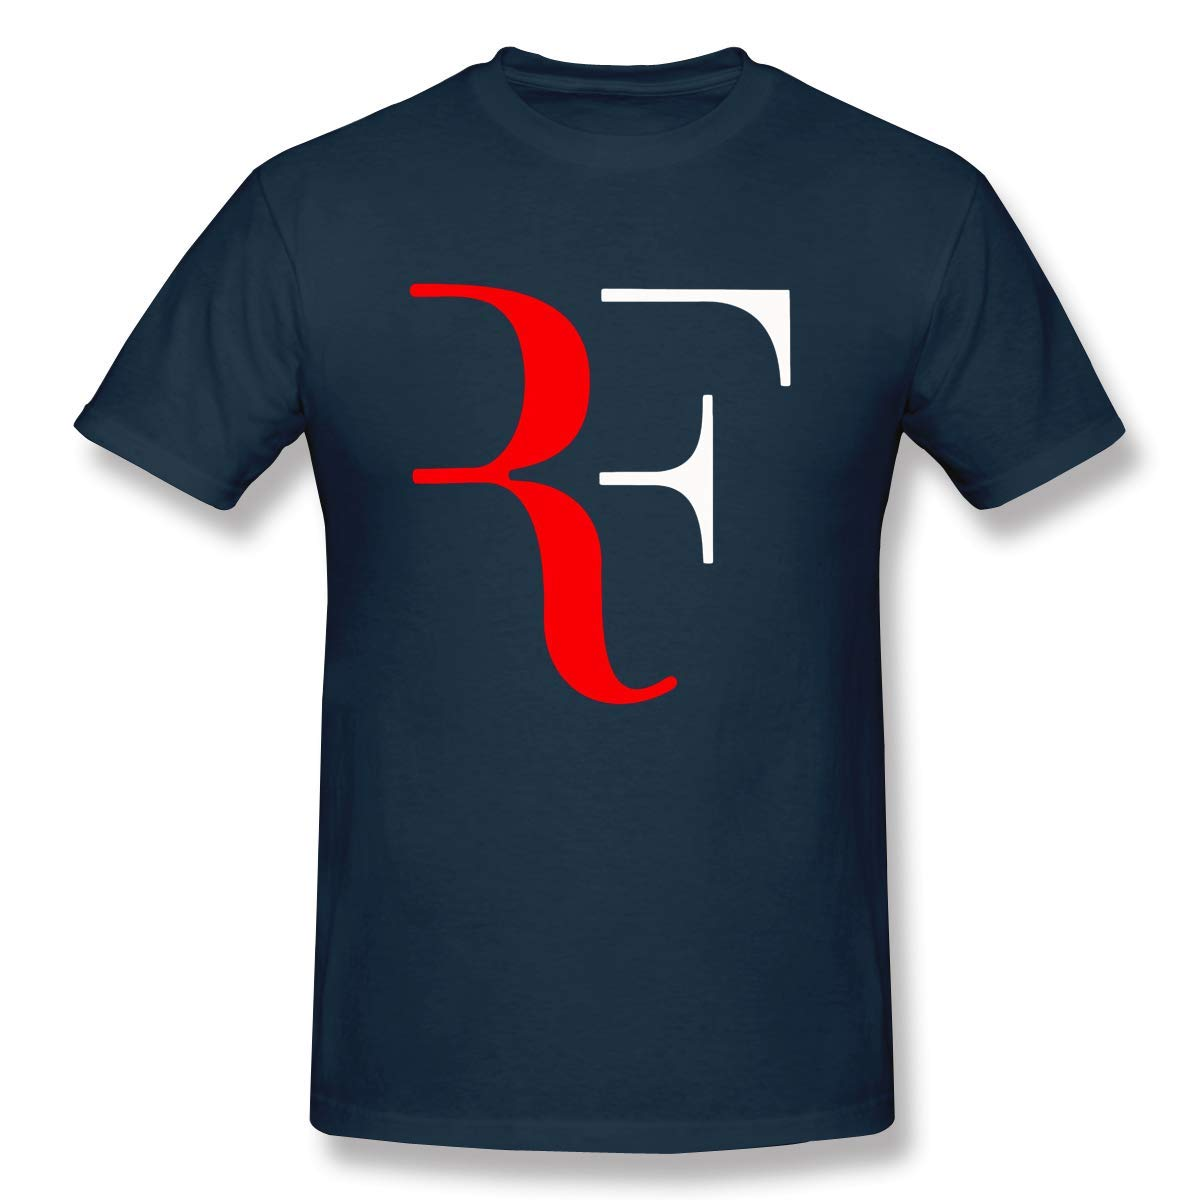 Roger Federer Camiseta de Manga Corta para Hombre Cómodas Mangas ...